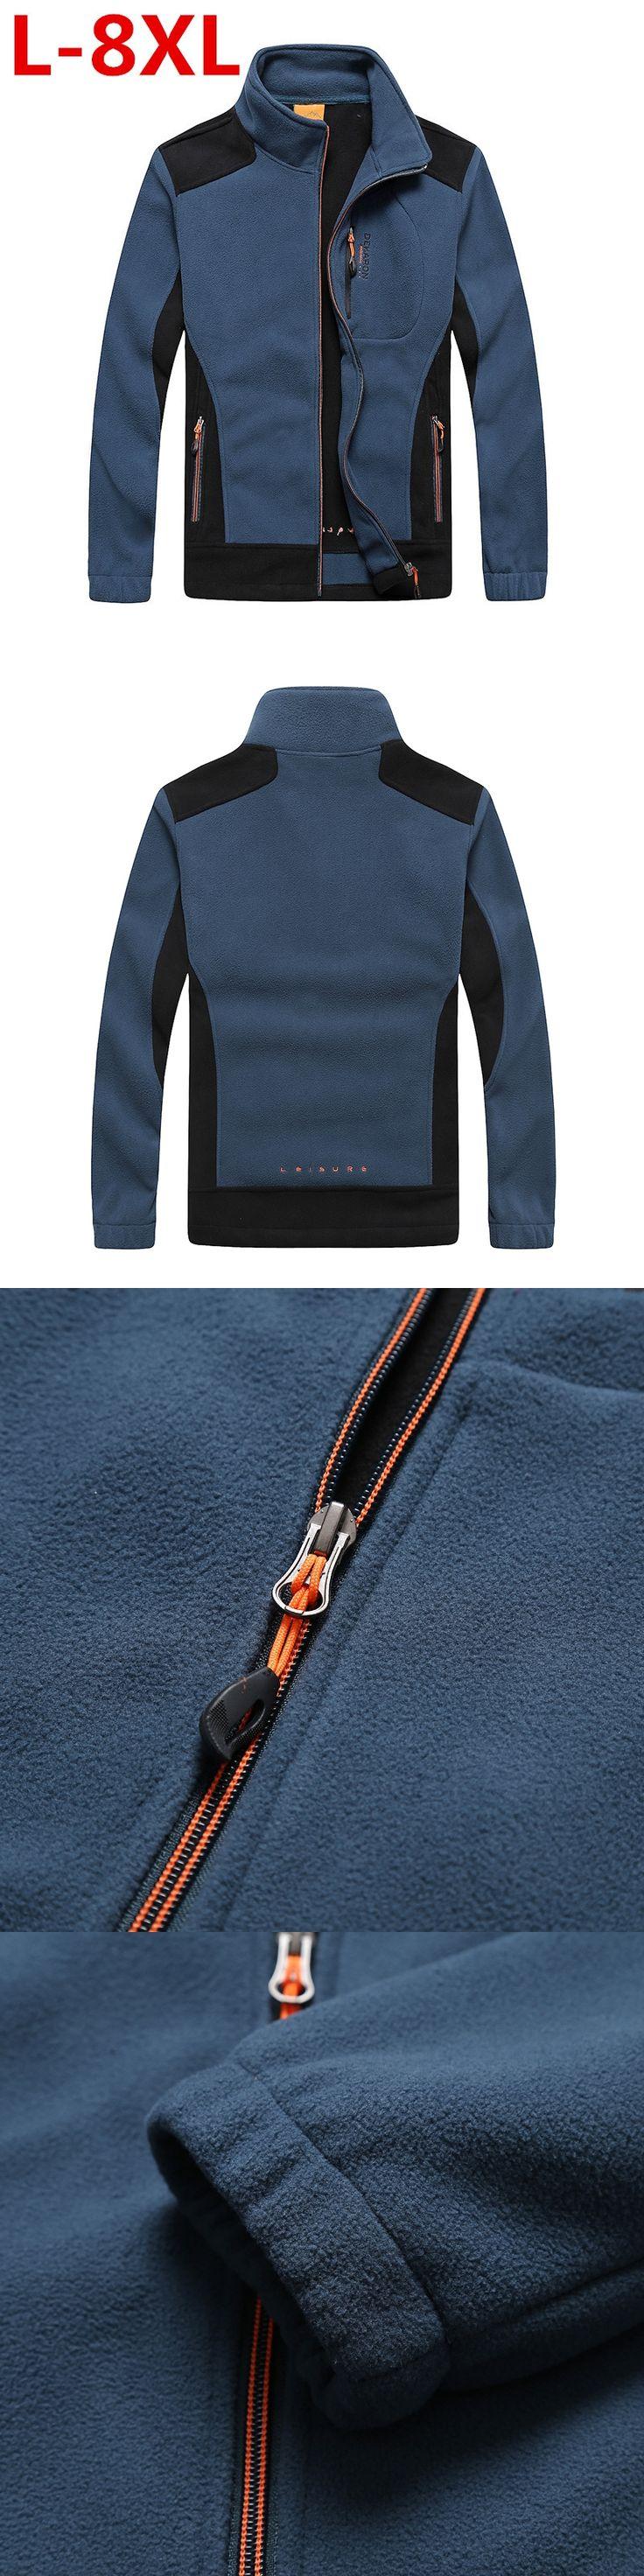 pluss size 8XL 7XL 6XLmens clothing autumn winter fleece army jacket softshell clothing for men softshell military style jackets